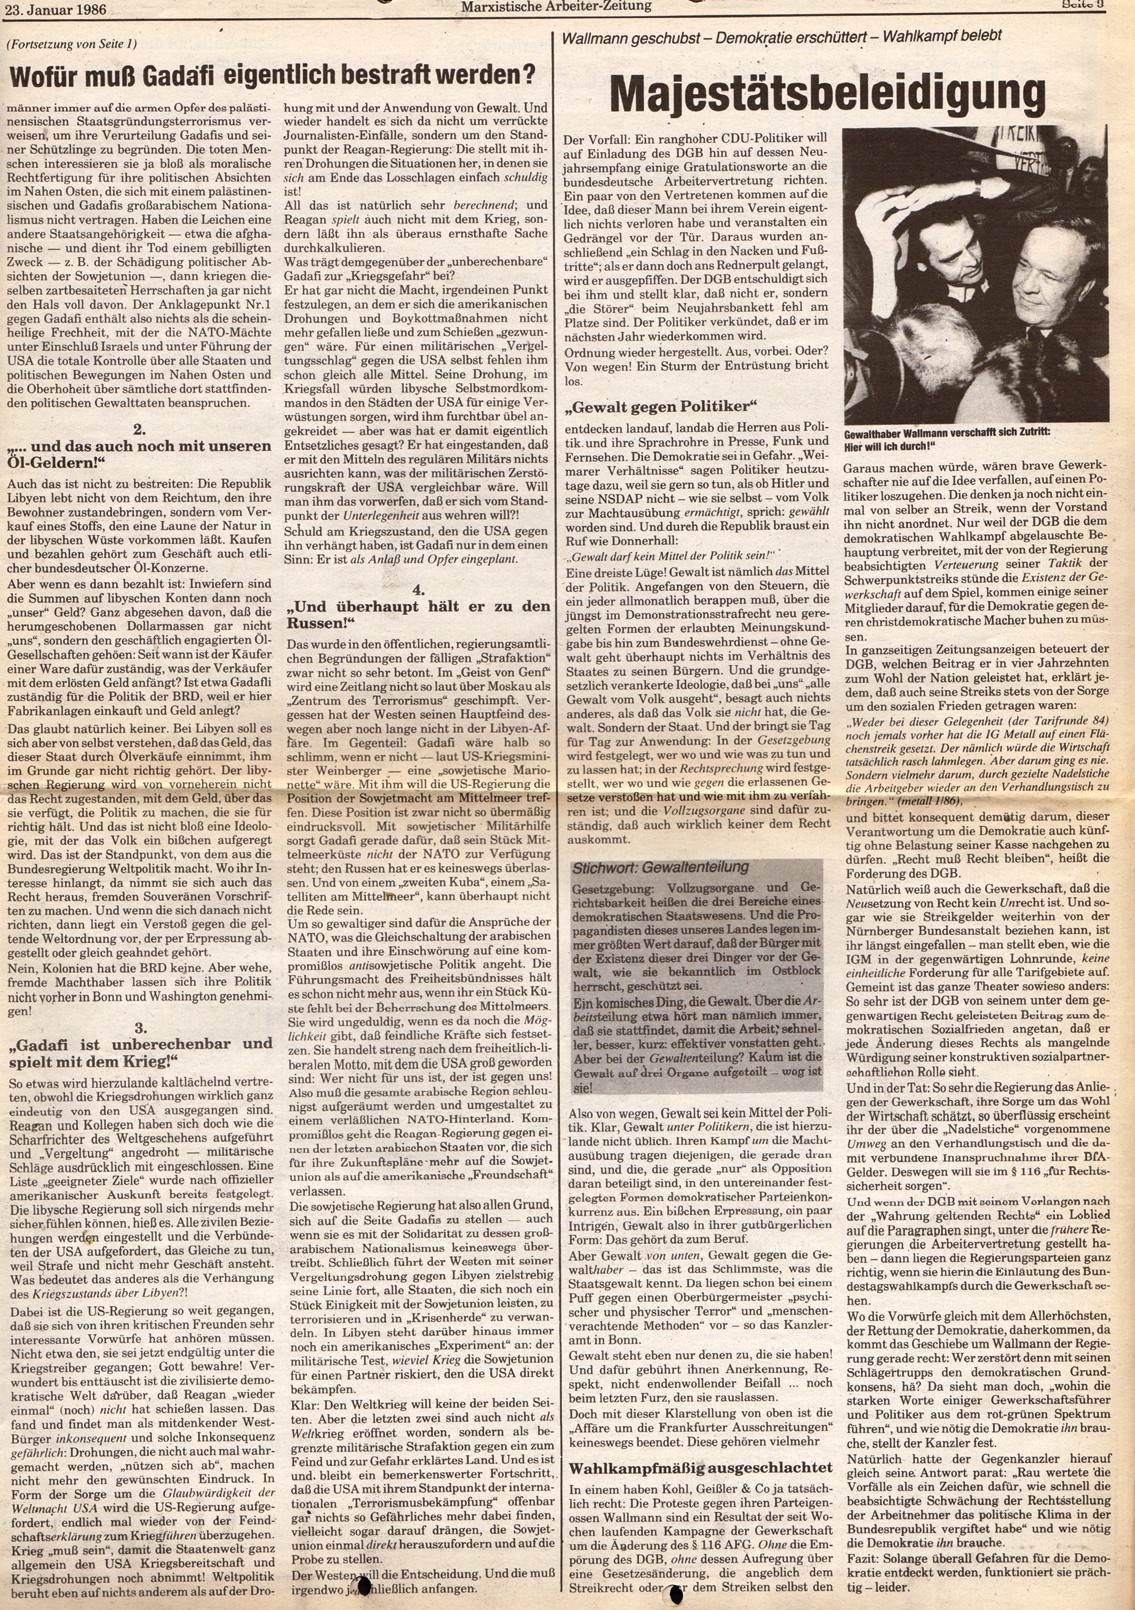 Muenchen_MG_MAZ_MAN_19860123_03